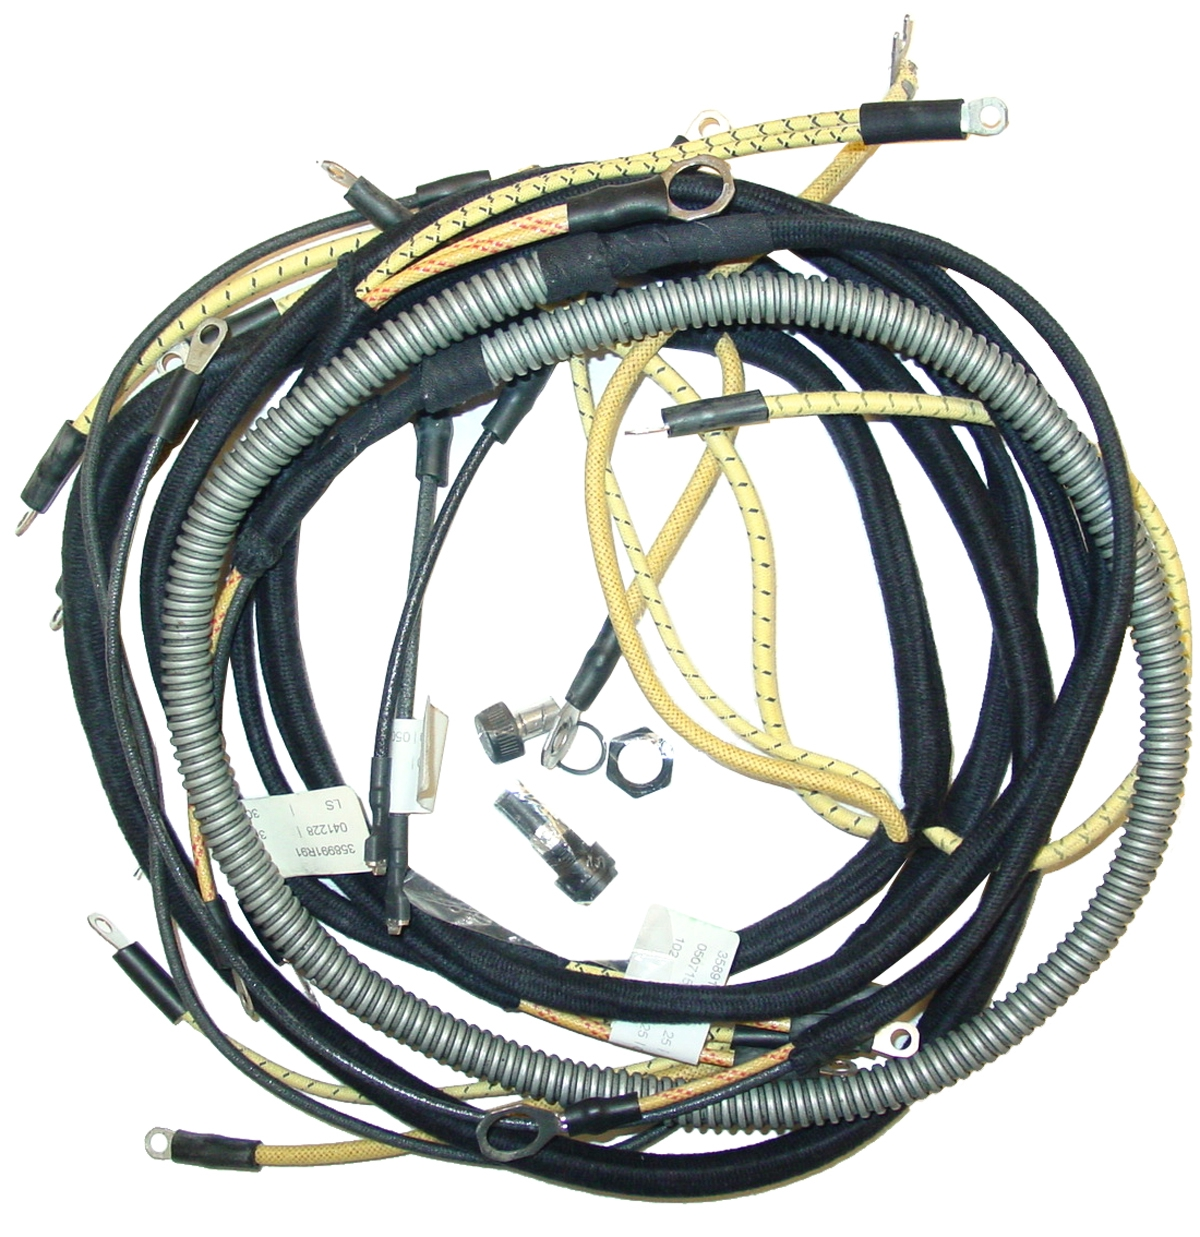 Farmall Super H Wiring Diagram Ih A